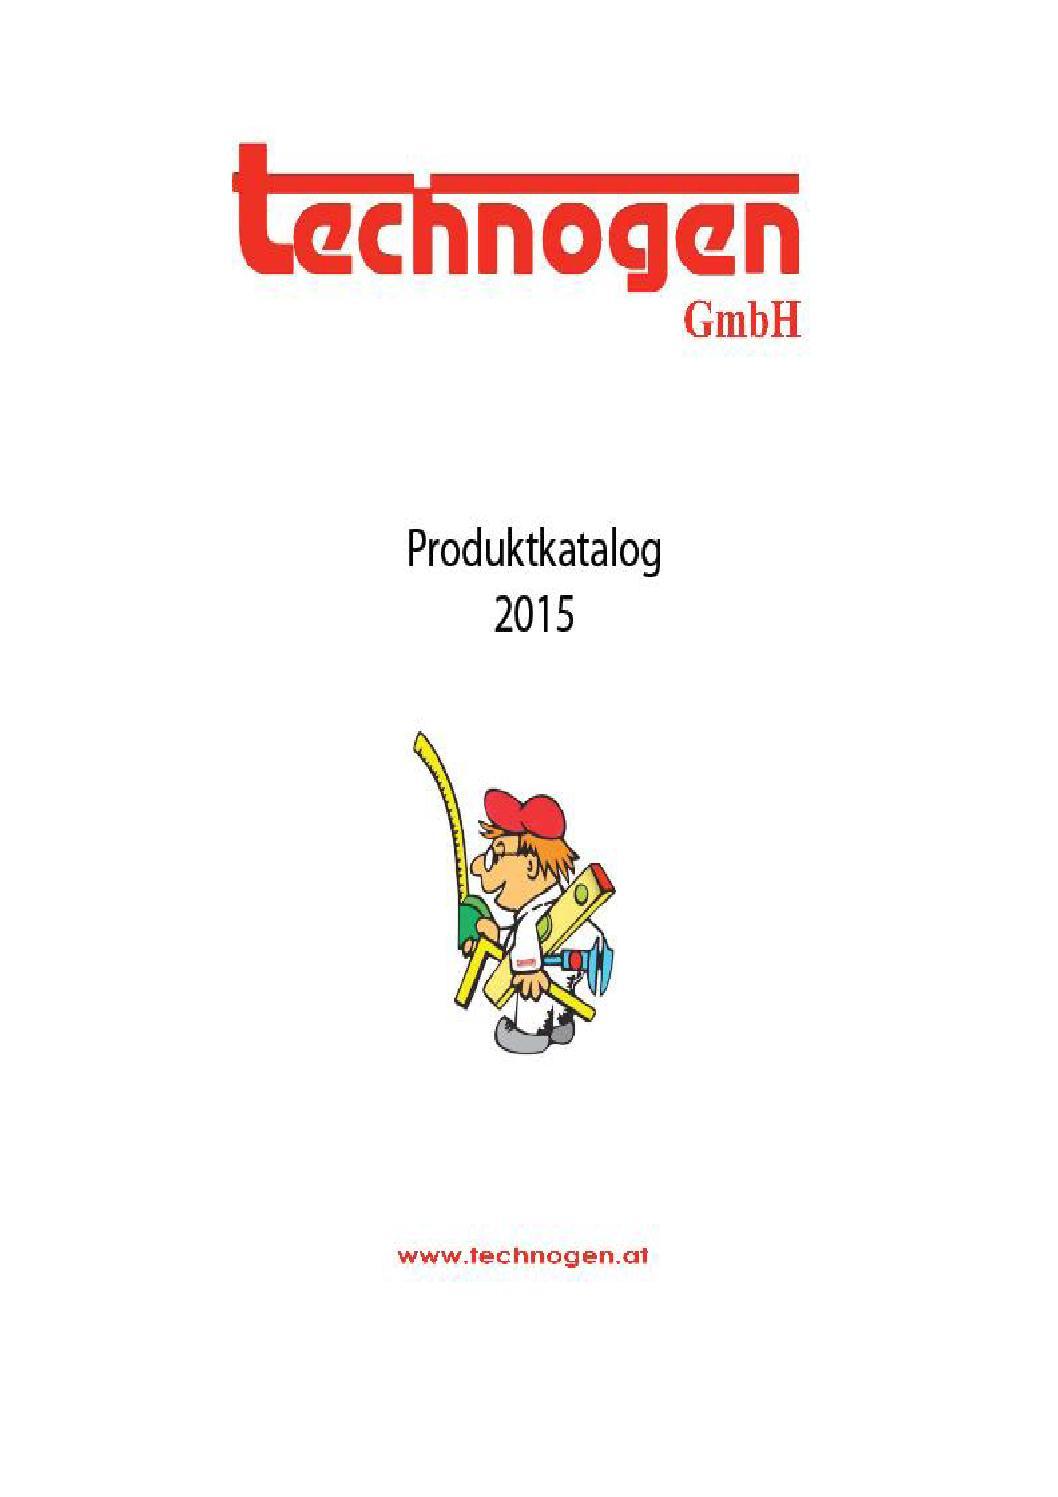 technogen Produktkatalog 2015 by technogen - issuu